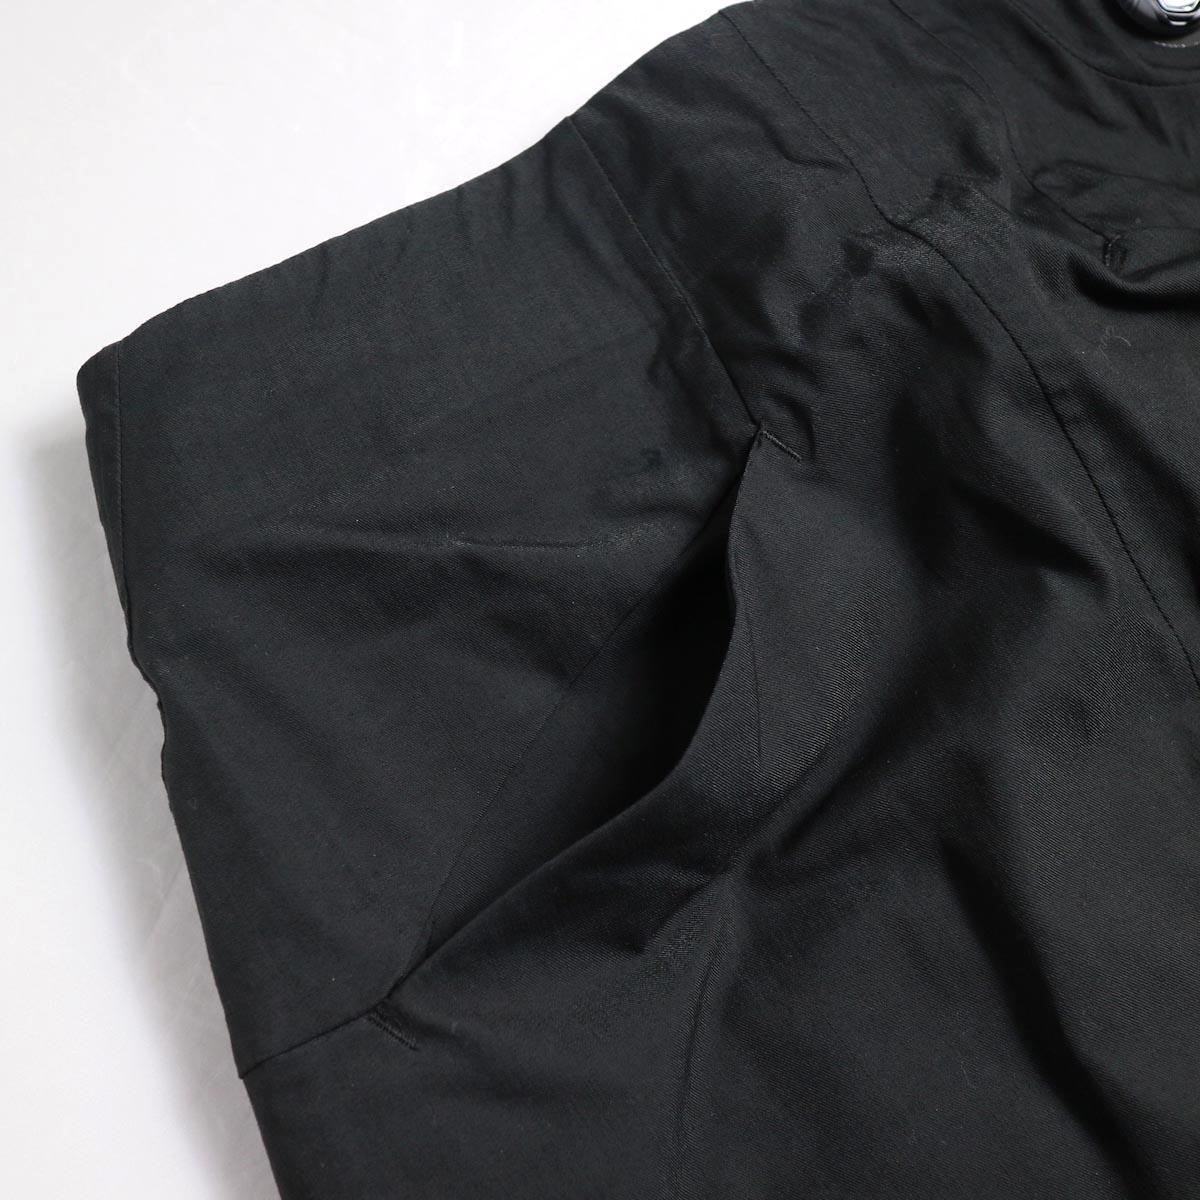 DESCENTE ALLTERAIN / Boa Long Pants Tapered Fit -Black バックポケット